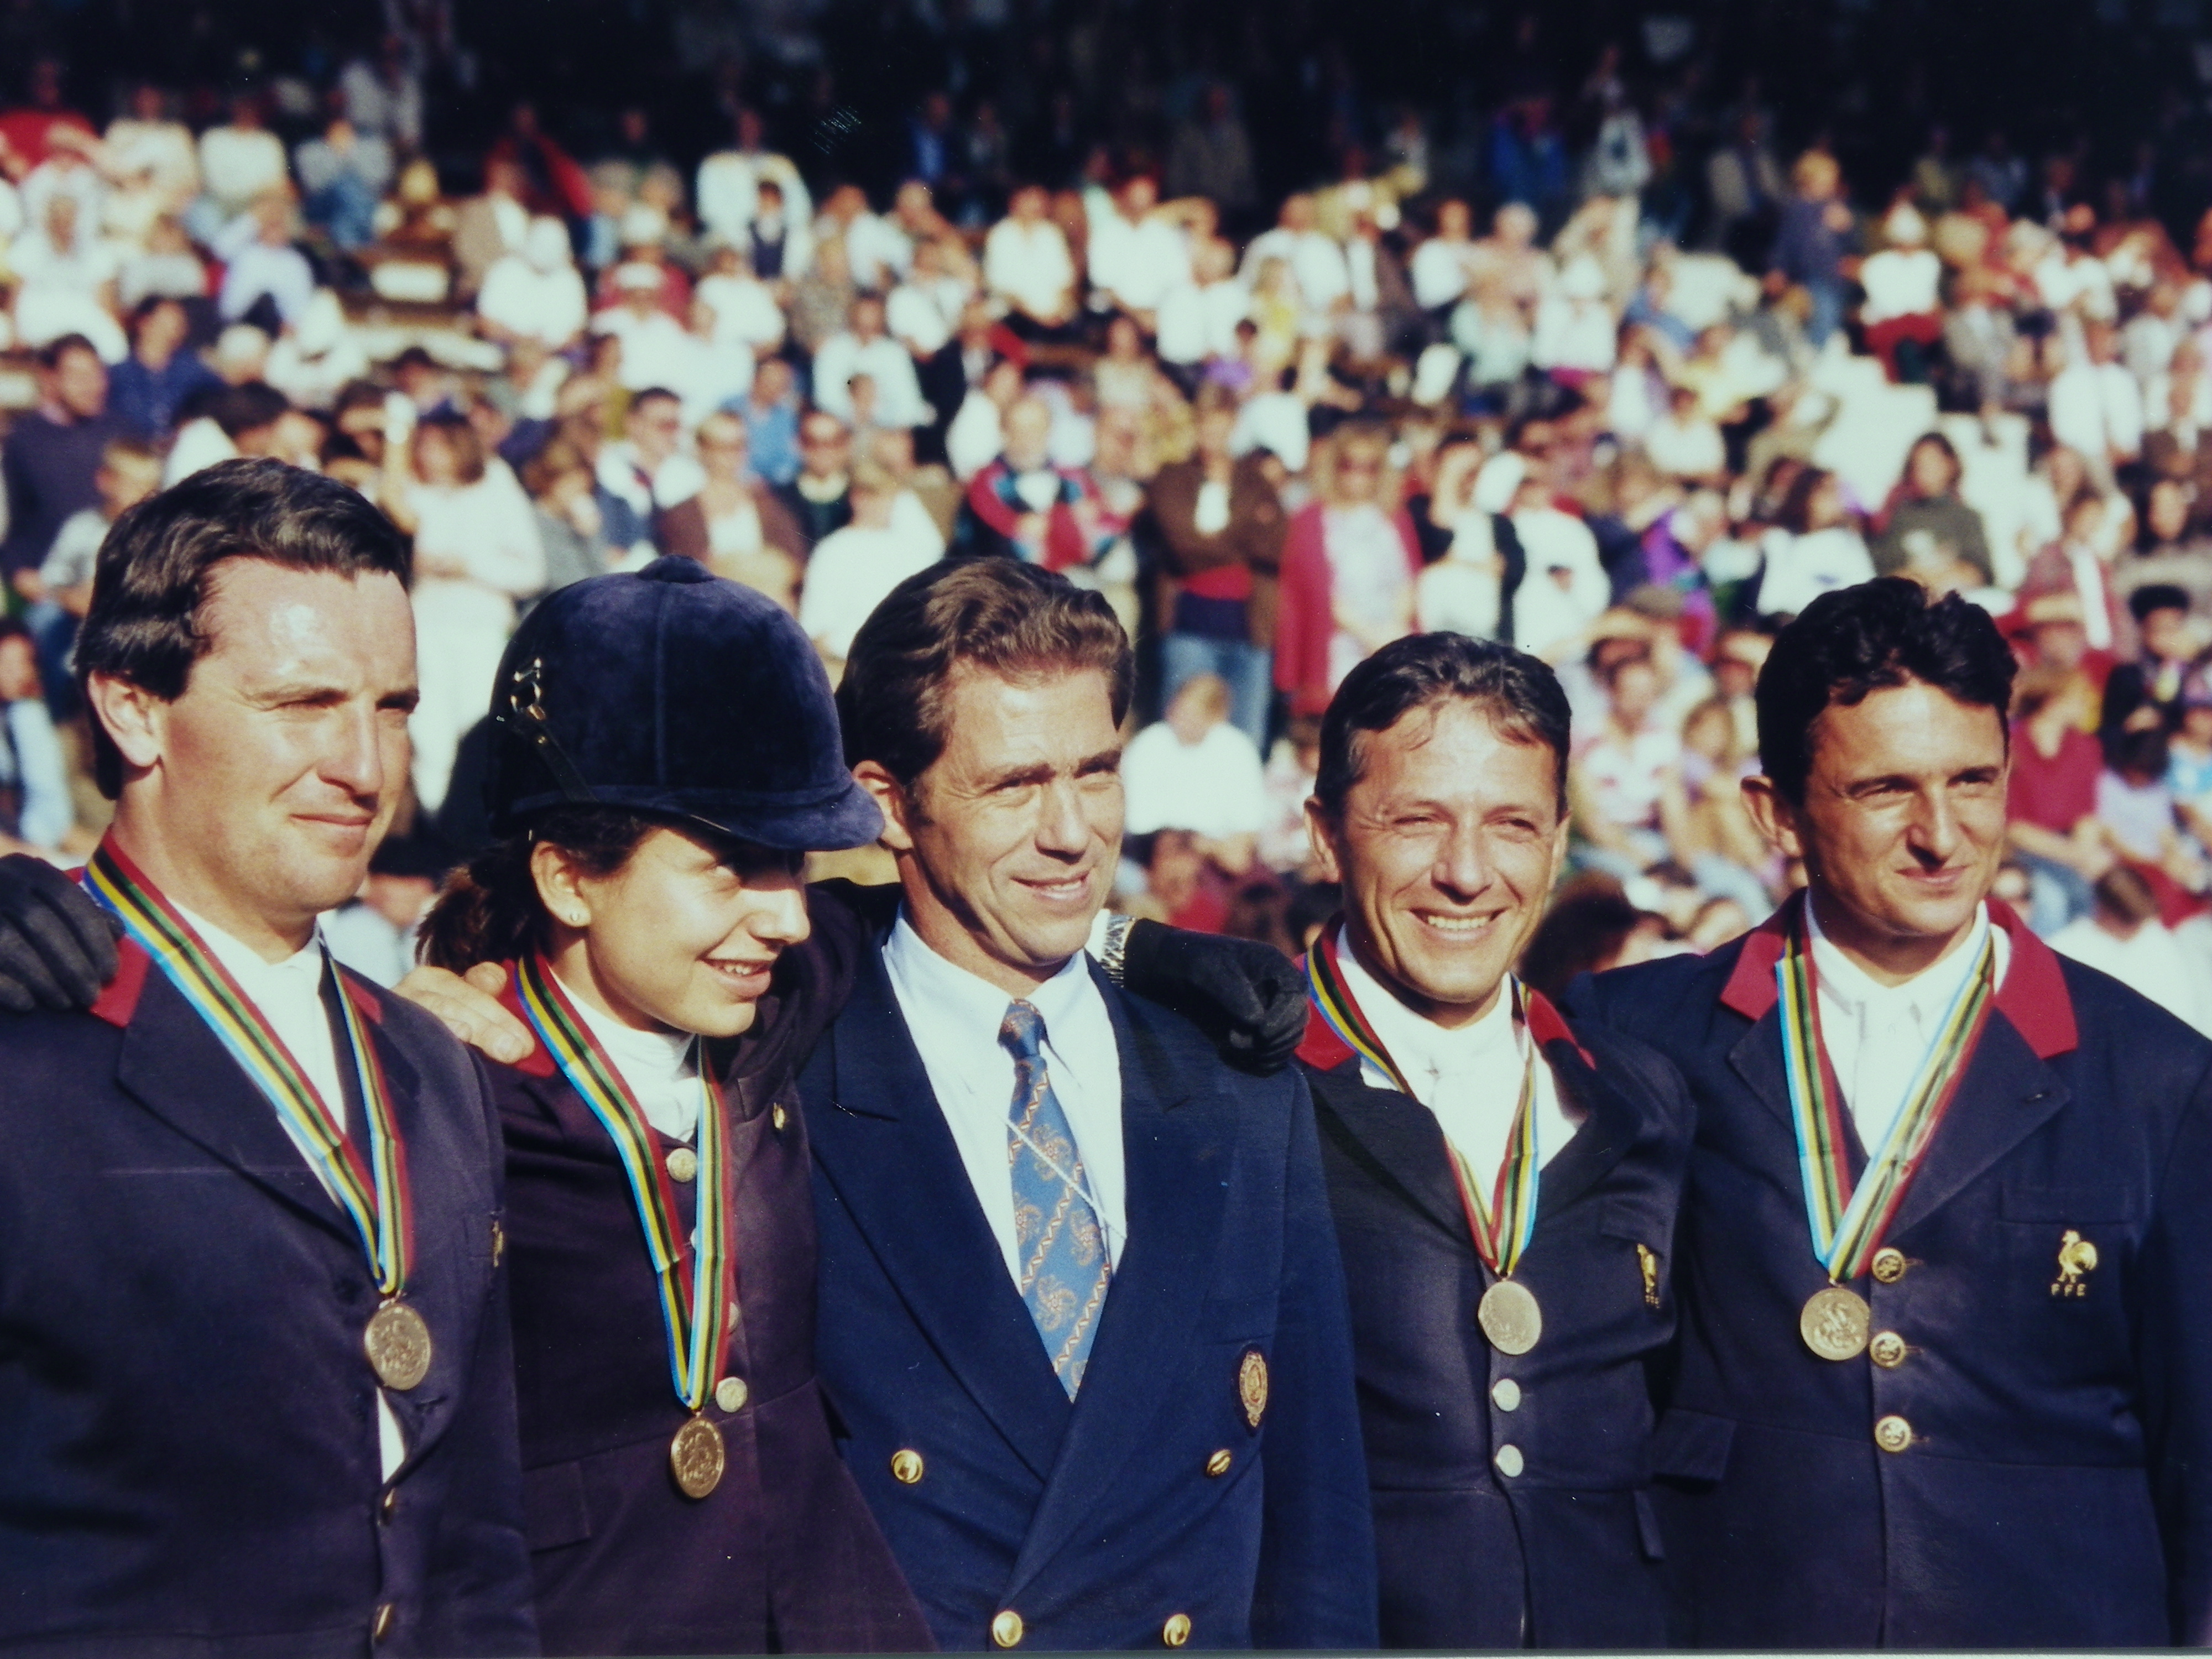 Championnats d'Europe de Saint-Gall en 1995.